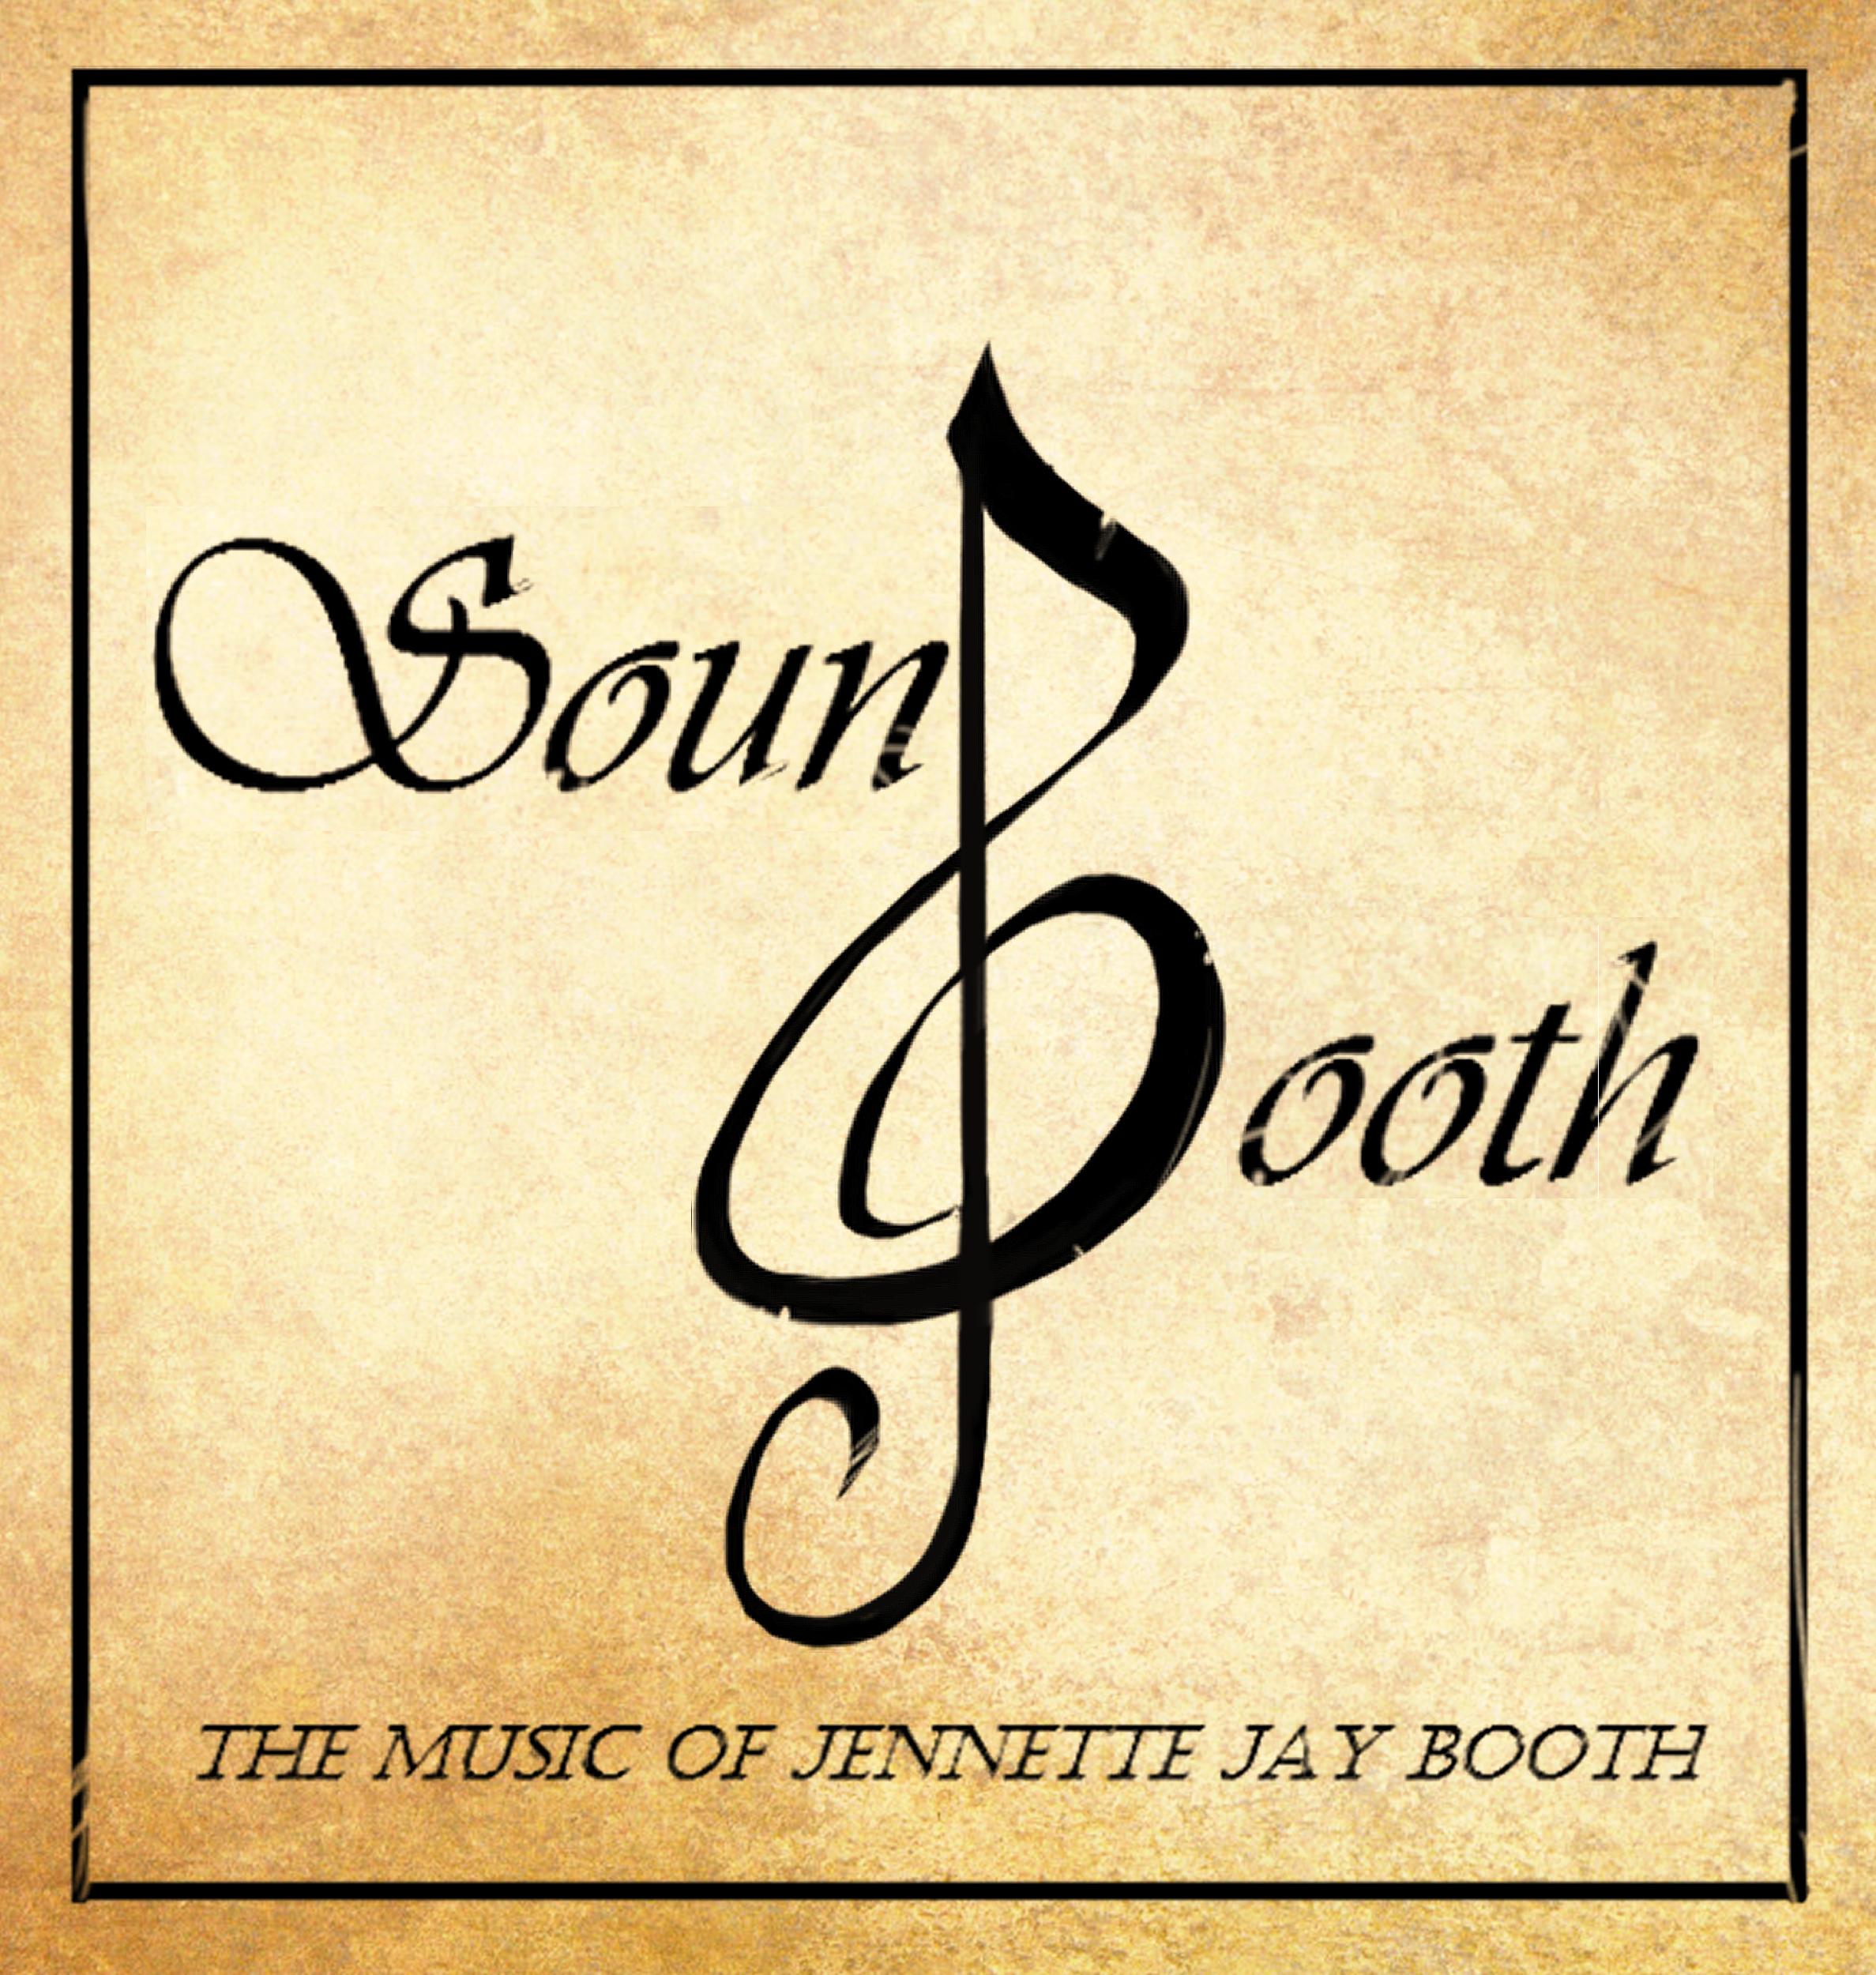 Sound Booth Studios